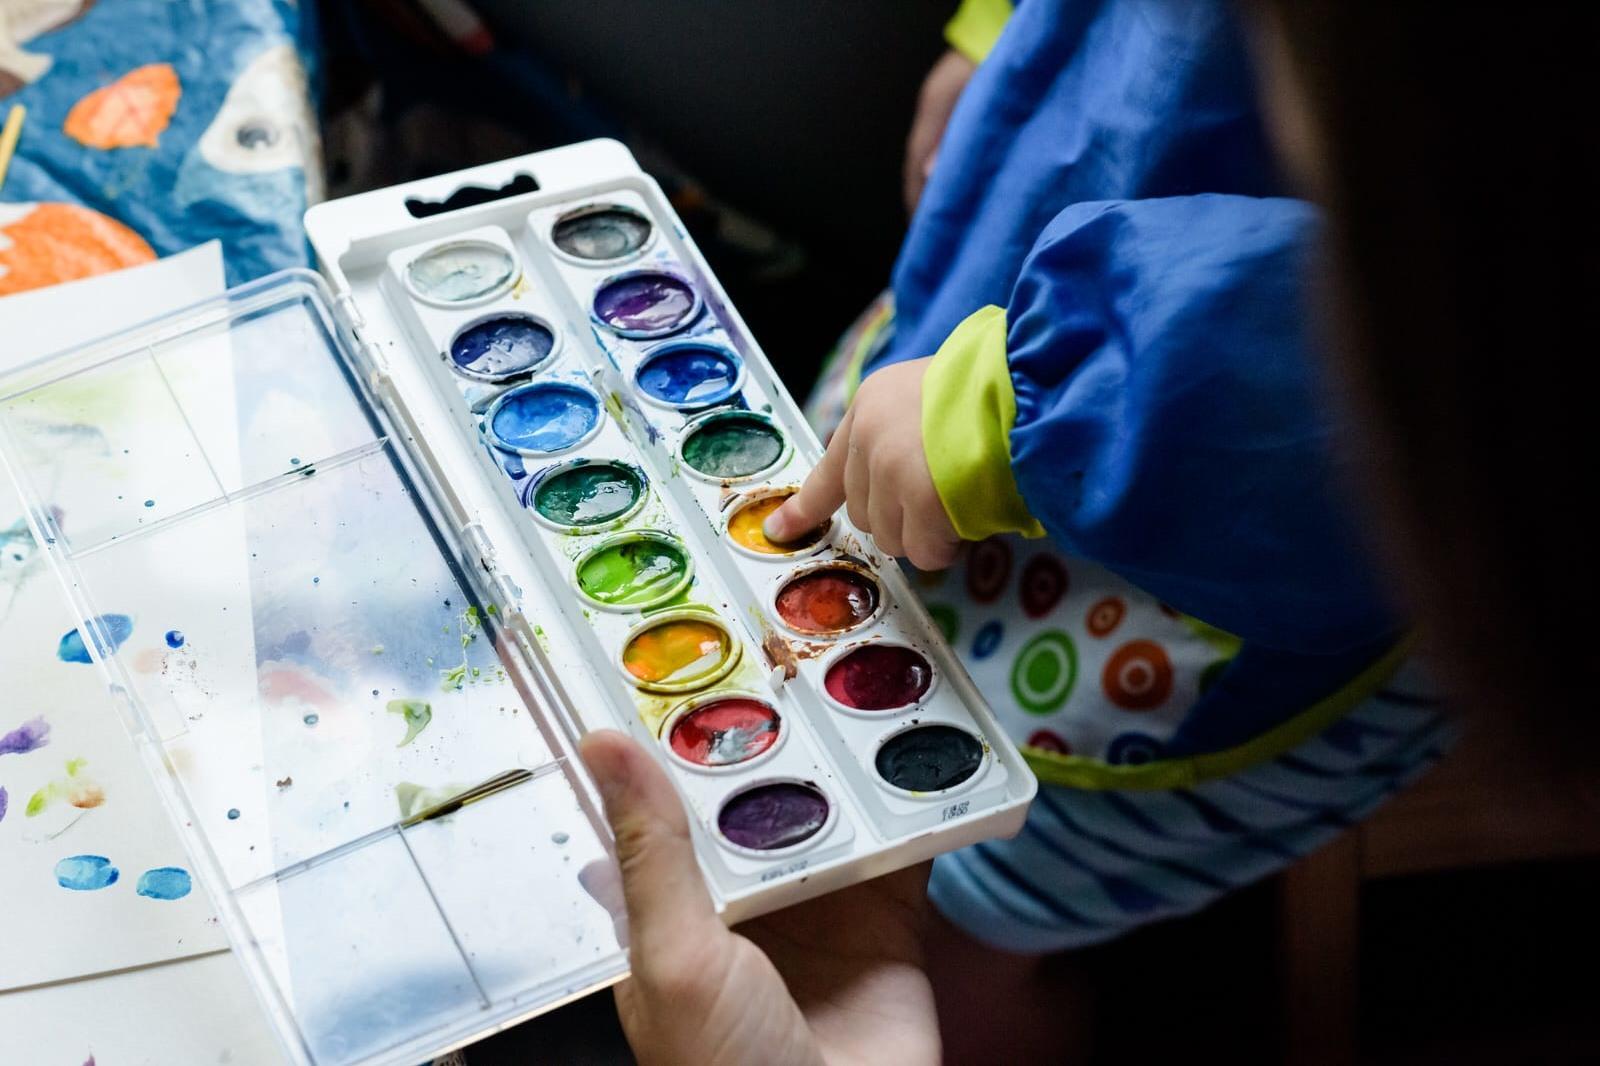 boy paints with fingers